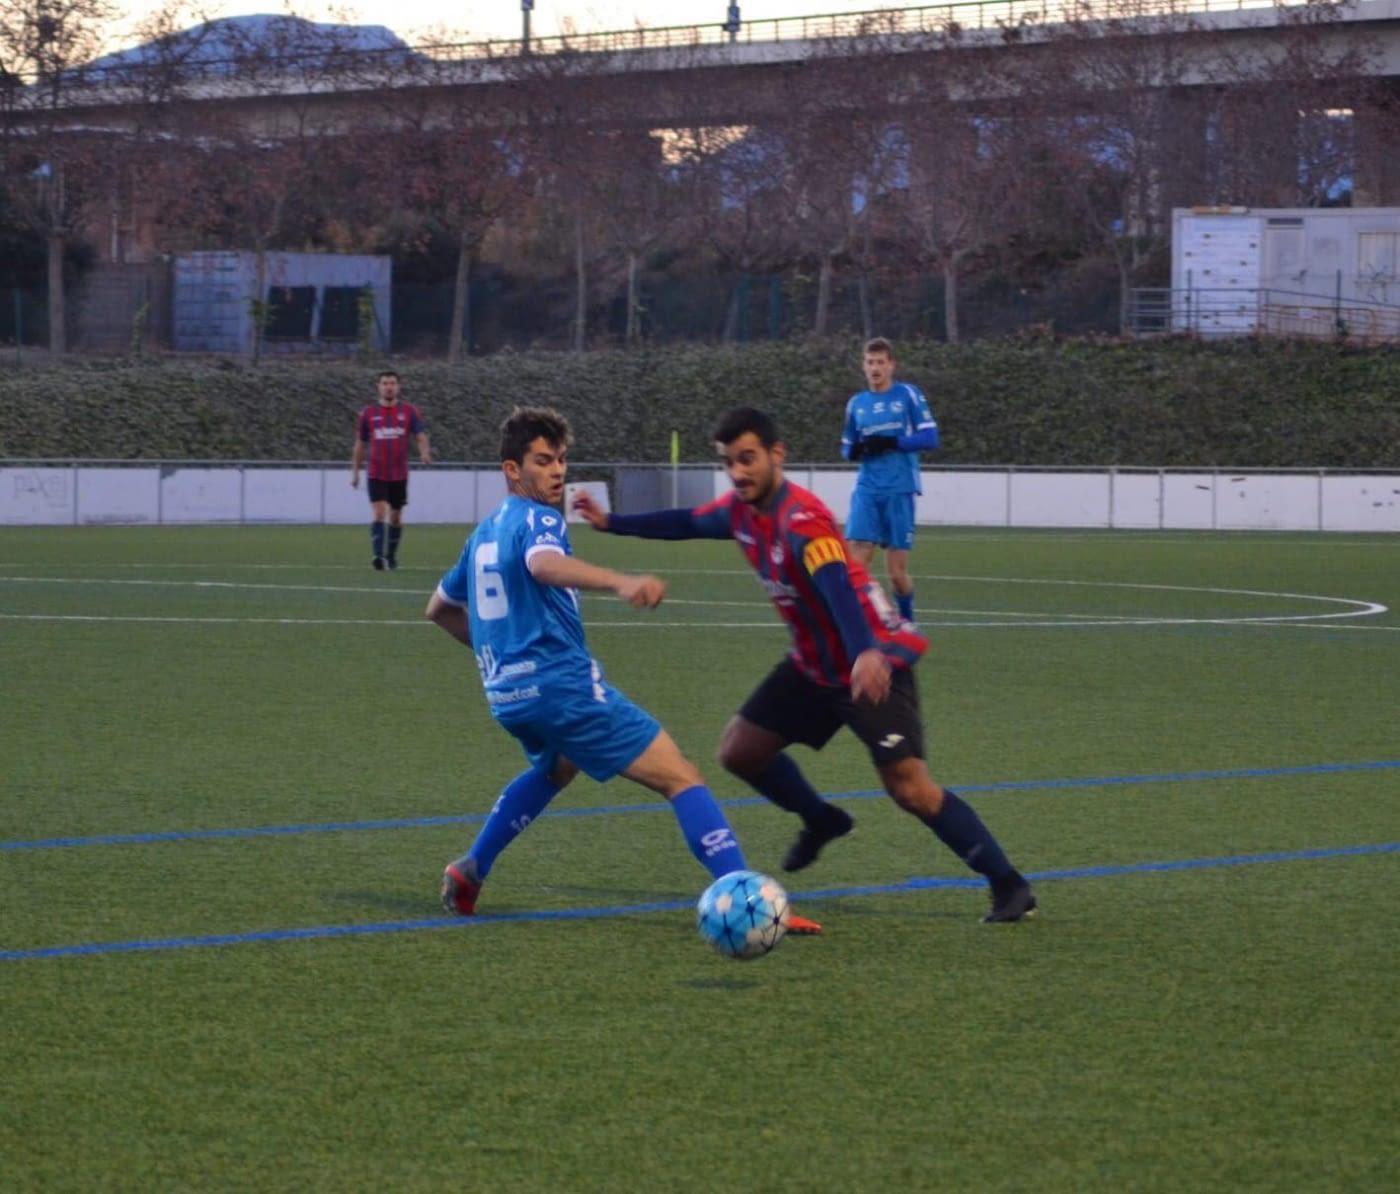 Crònica - Jornada 17 Primera Catalana: C.E Unio Cambrils  0-0  U.E.Tàrrega